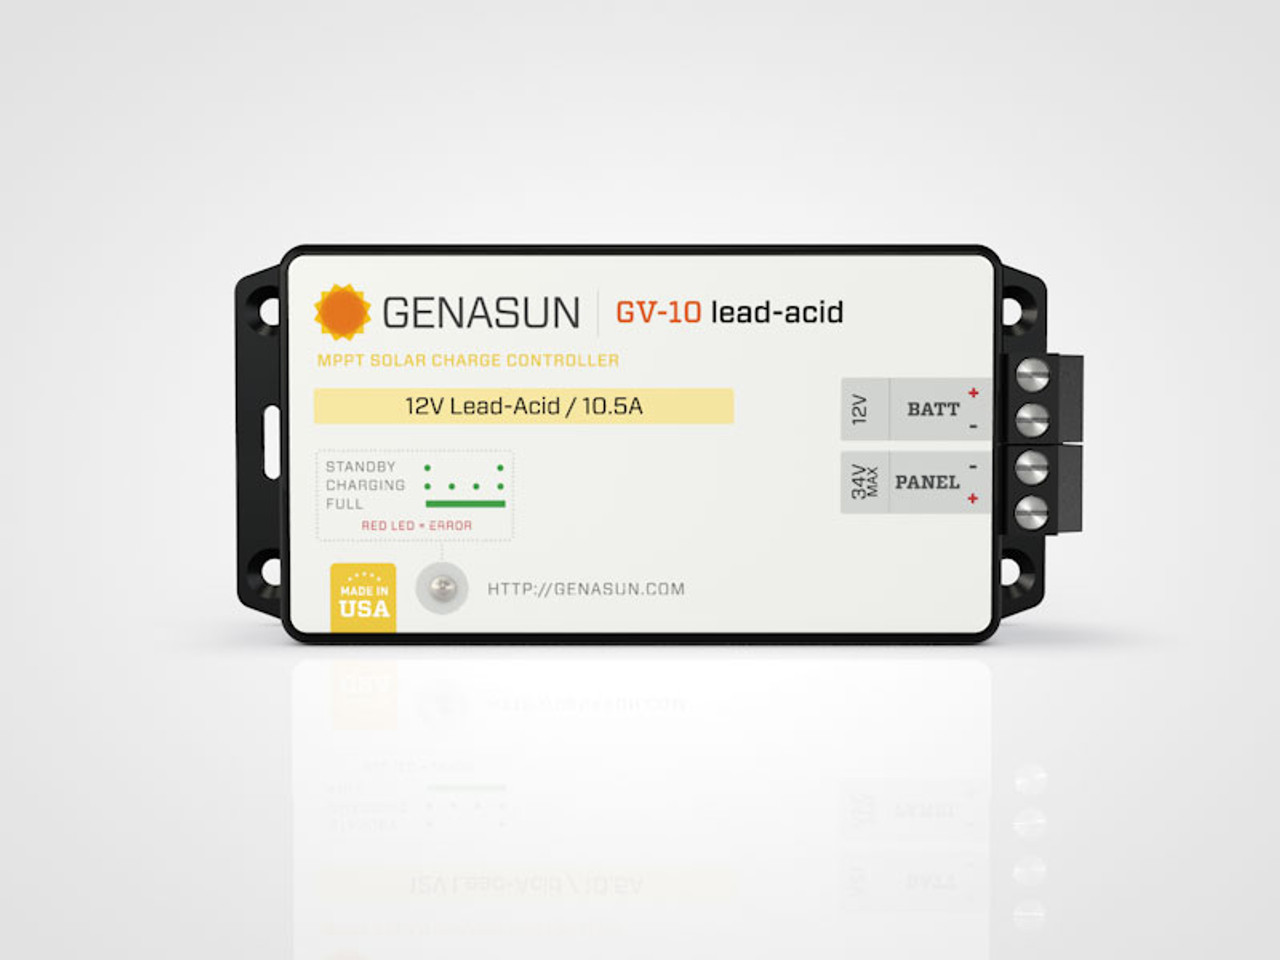 GV-10 | 140W 10.5A Genasun MPPT Solar Charge Controller - Pb - Front